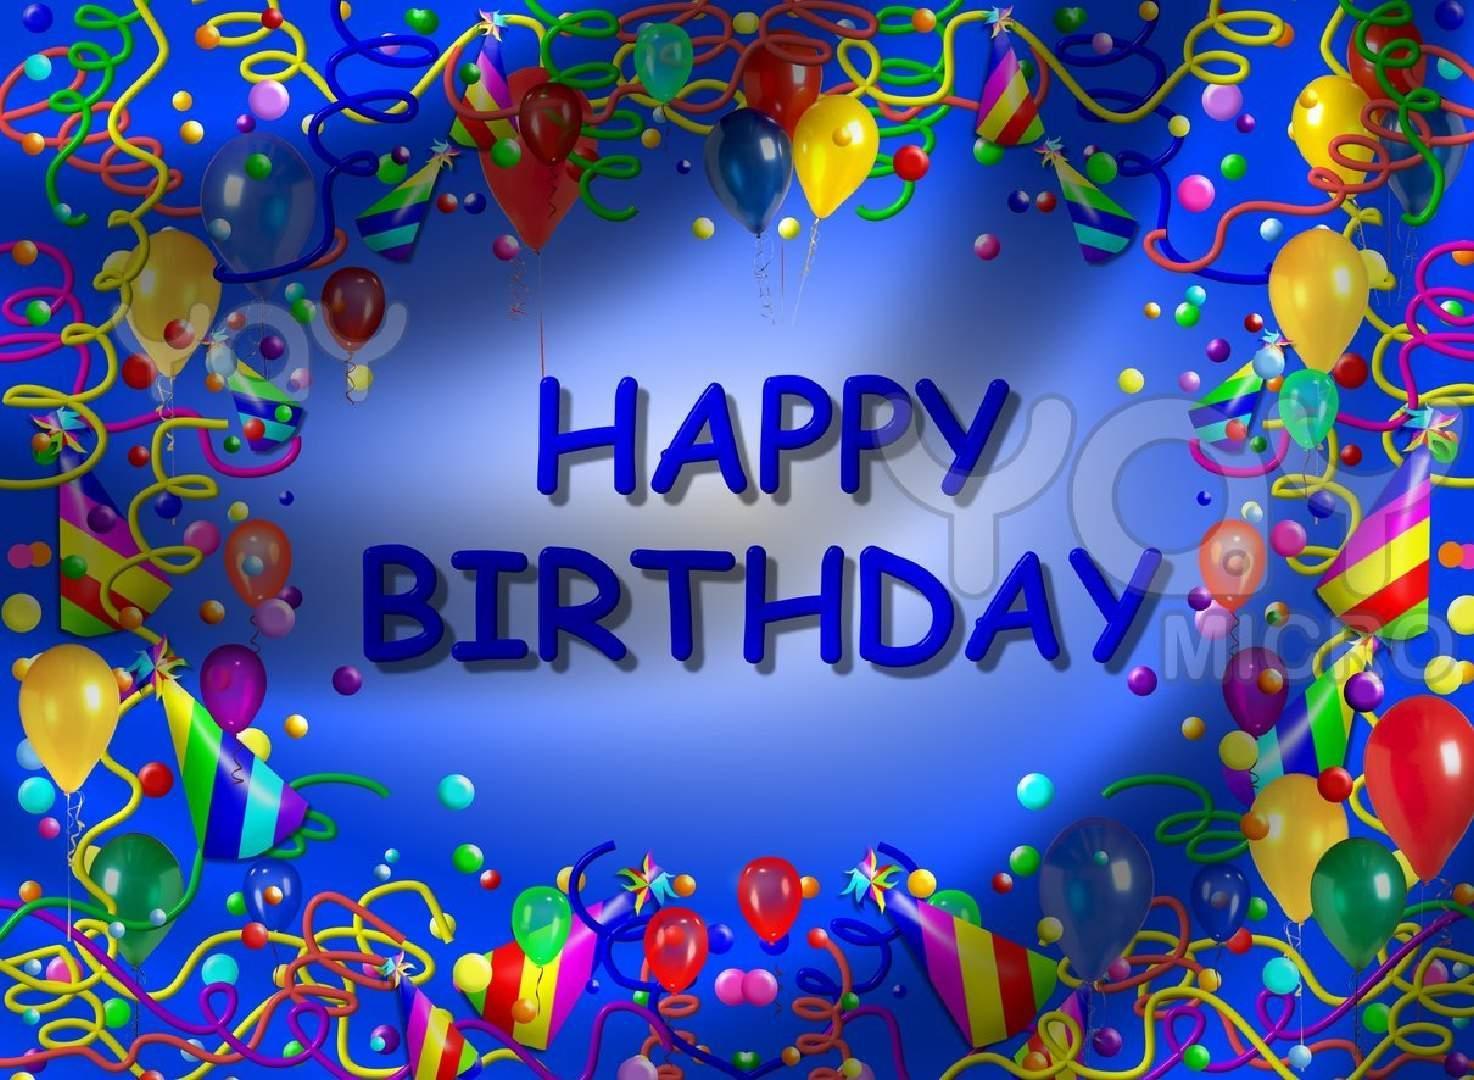 free happy birthday wallpaper - sf wallpaper